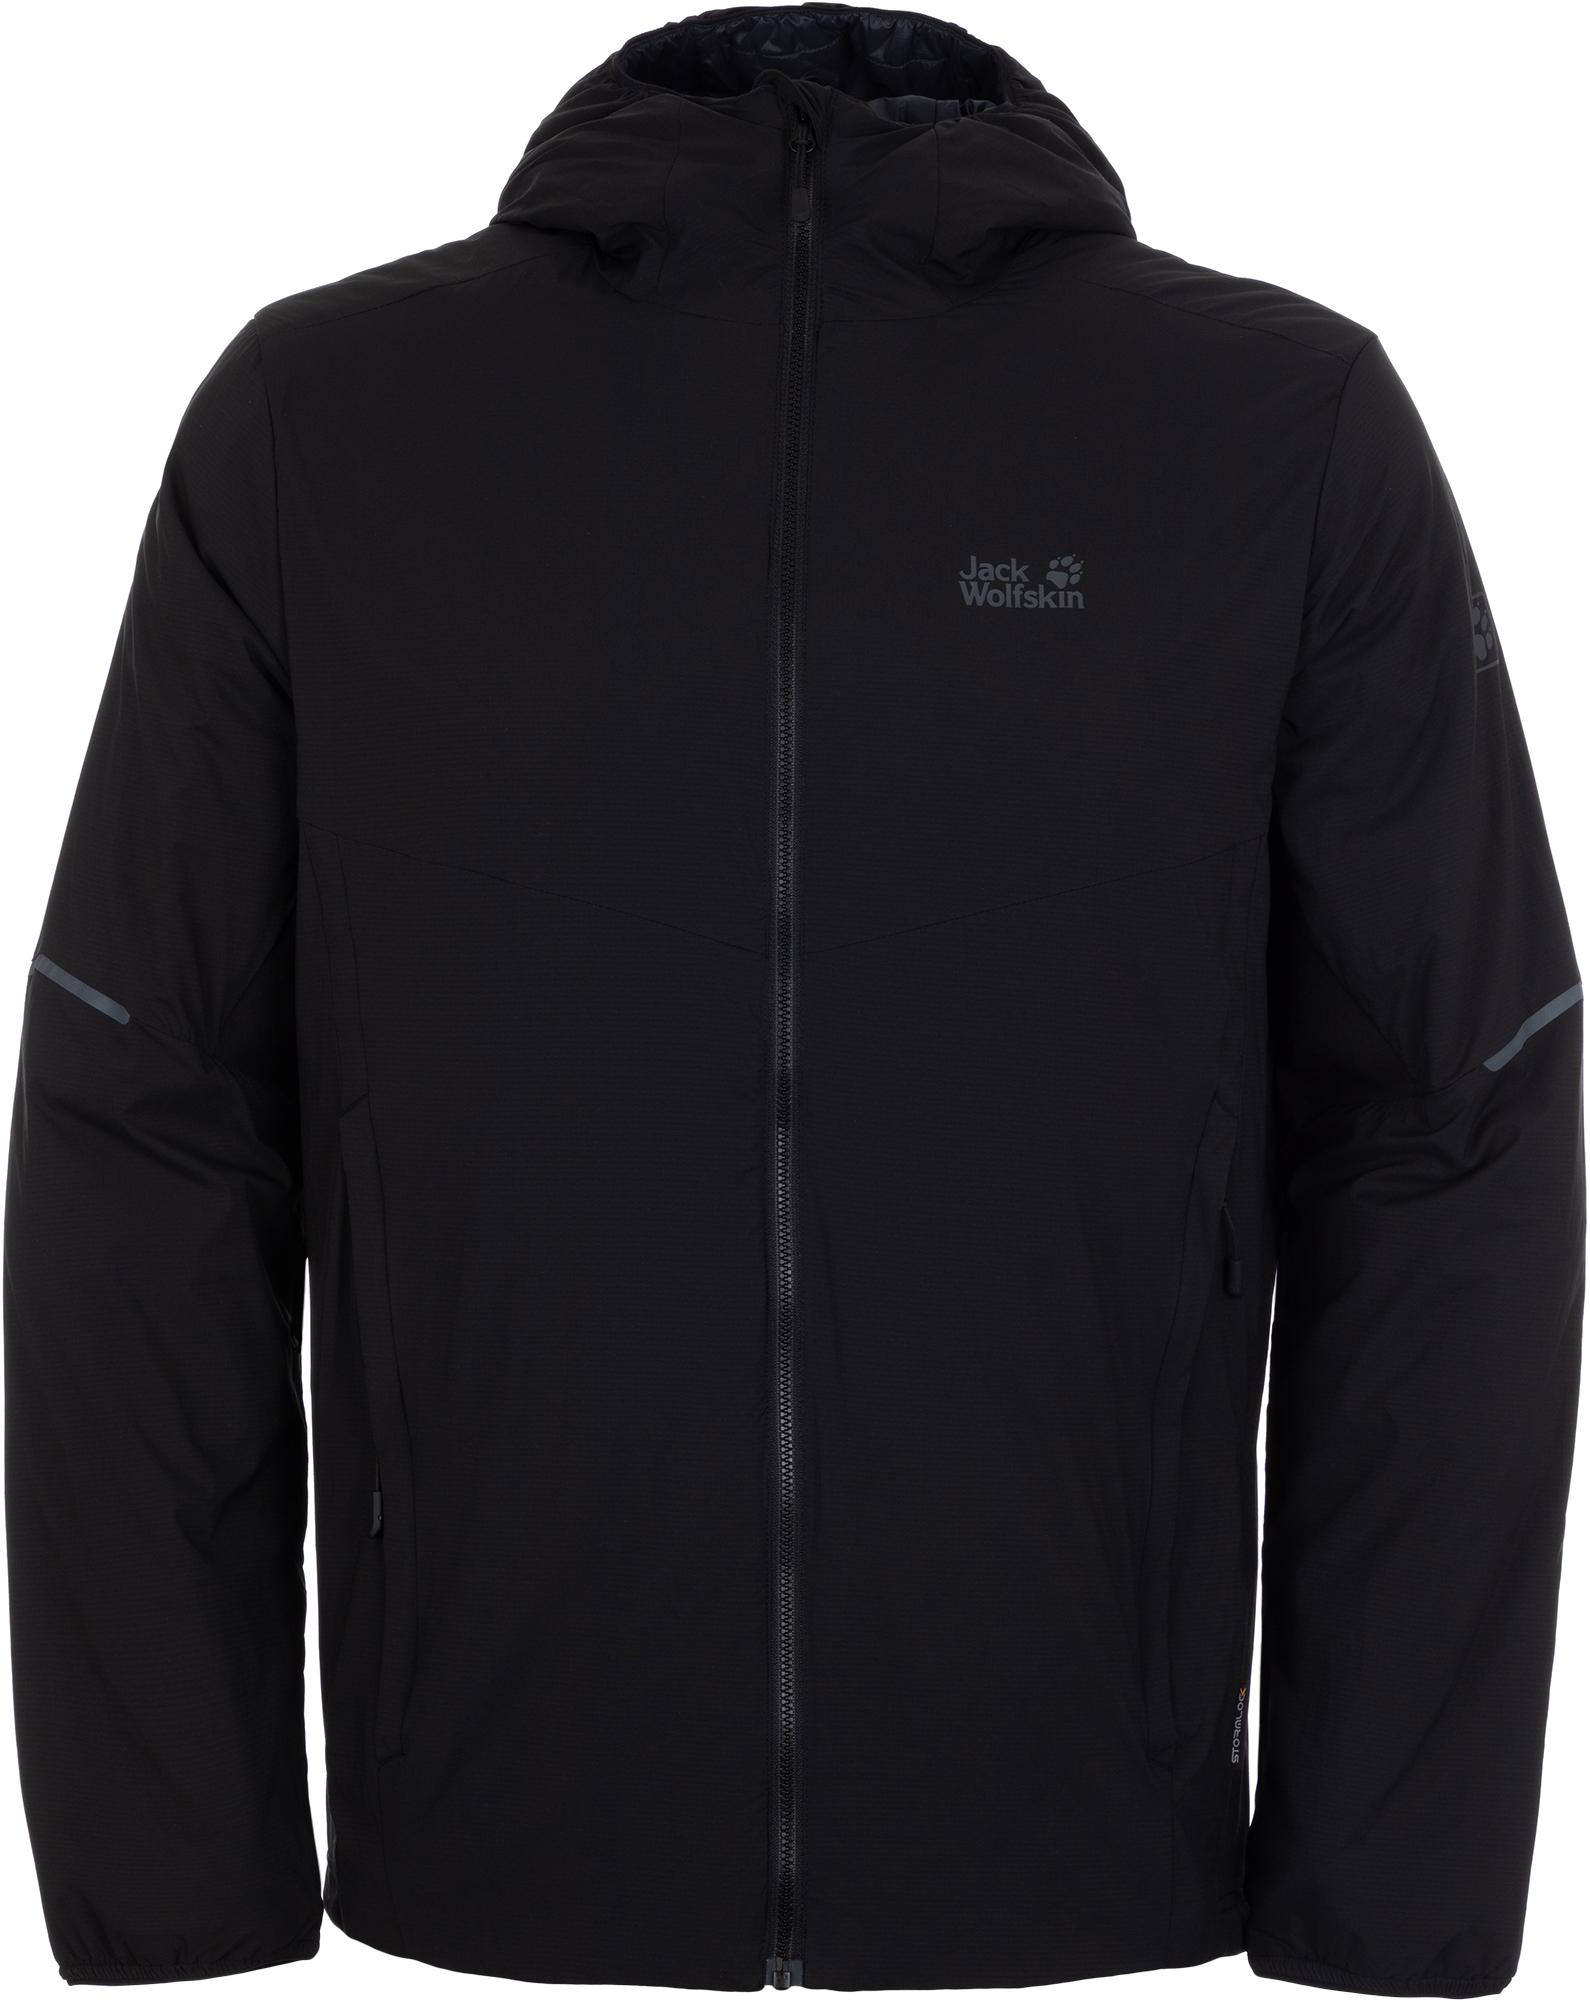 Jack Wolfskin Куртка утепленная мужская JACK WOLFSKIN Opouri Peak, размер 50-52